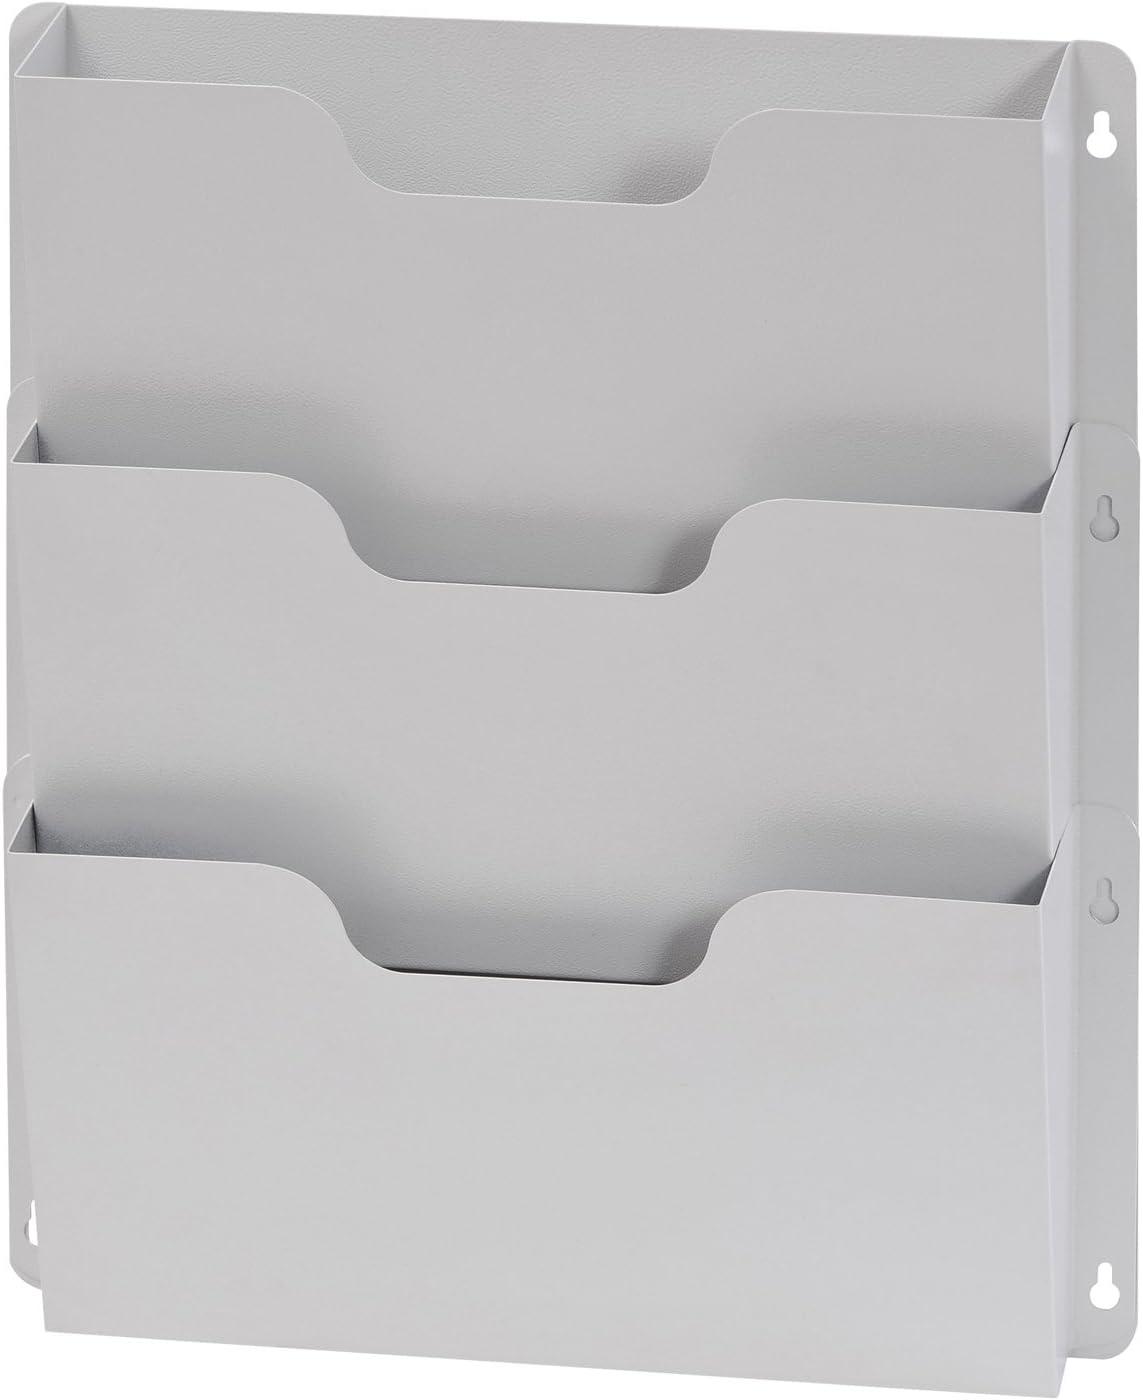 Buddy 5210 Platinum 32 Triple Wall Pocket Steel 17.5 x 14.5.x 2.5 Inches